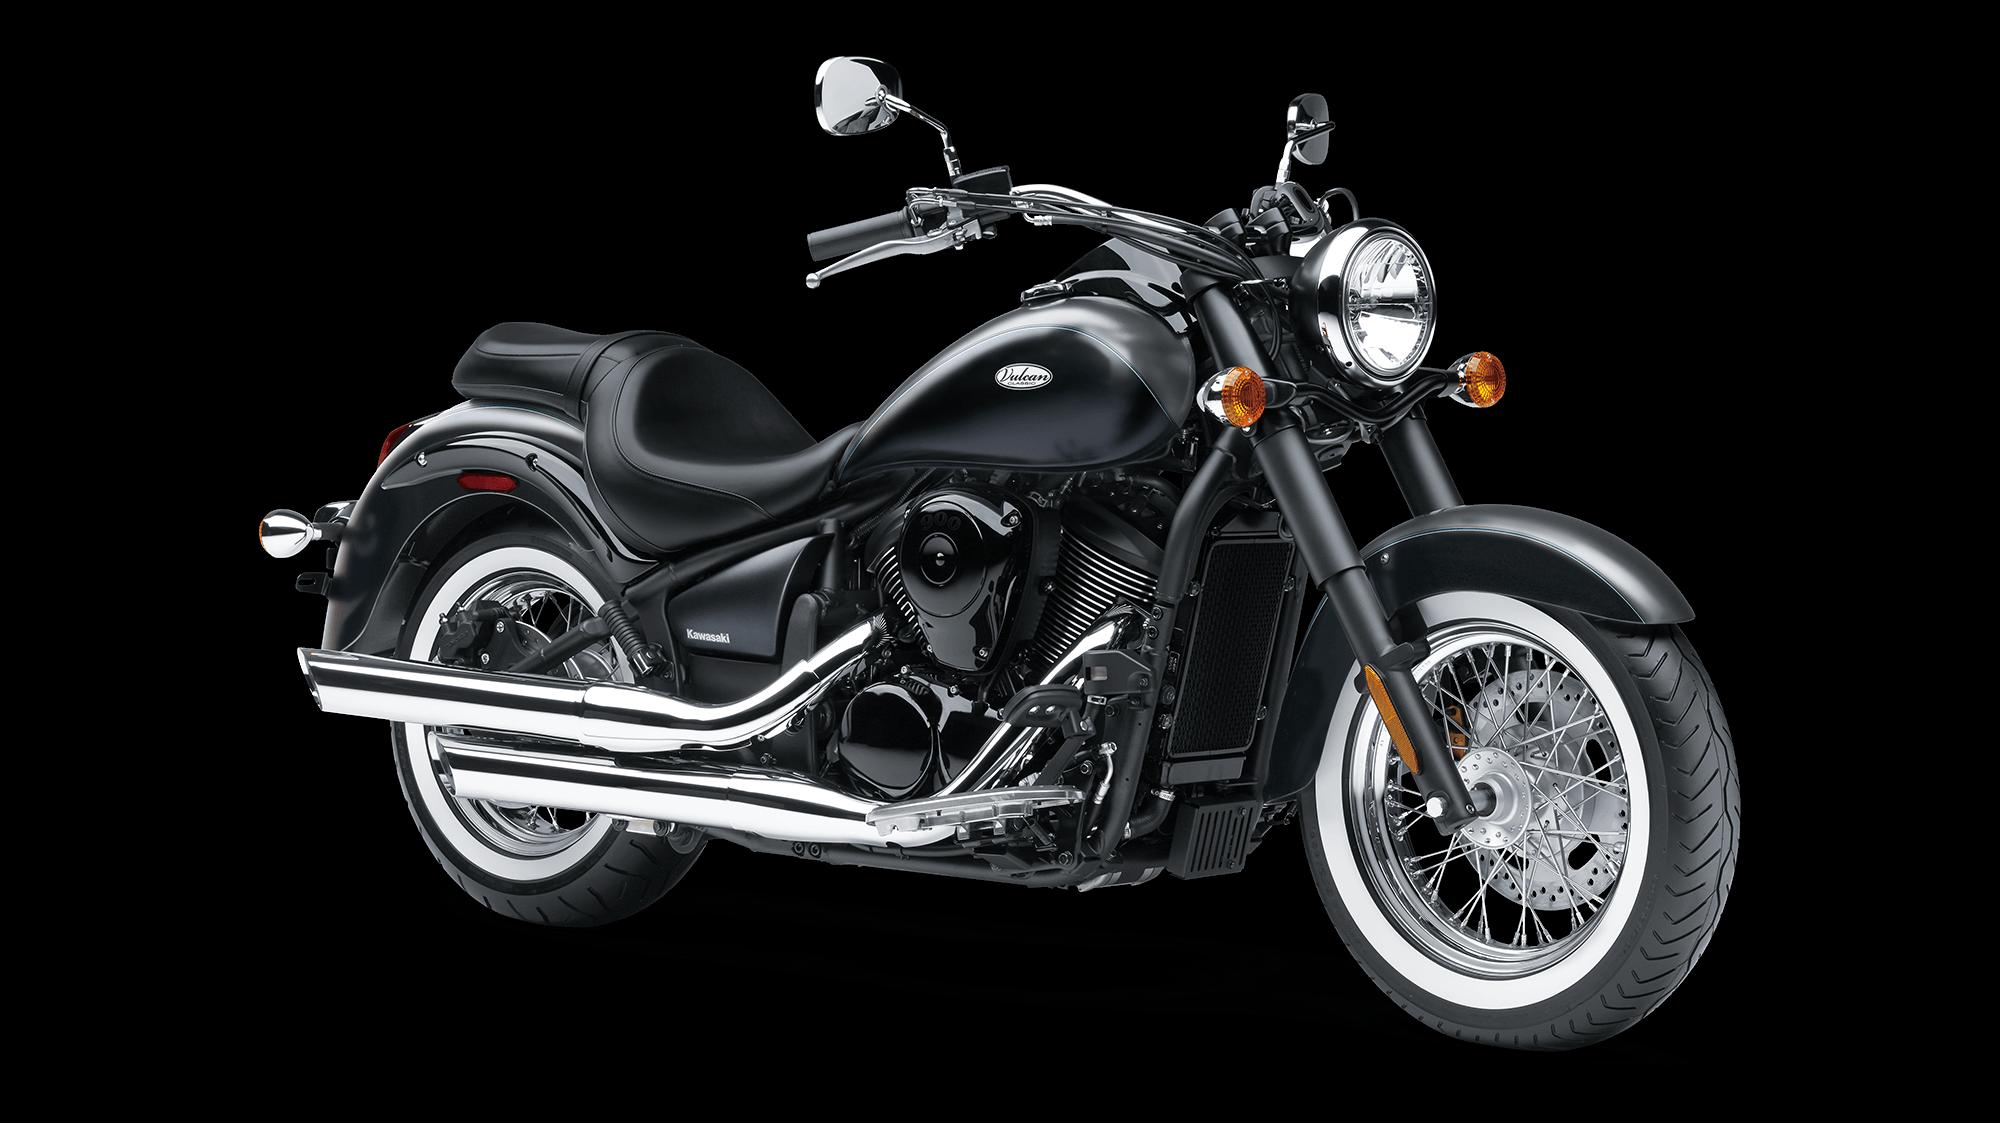 2019 Vulcan 900 Classic Vulcan Motorcycle By Kawasaki